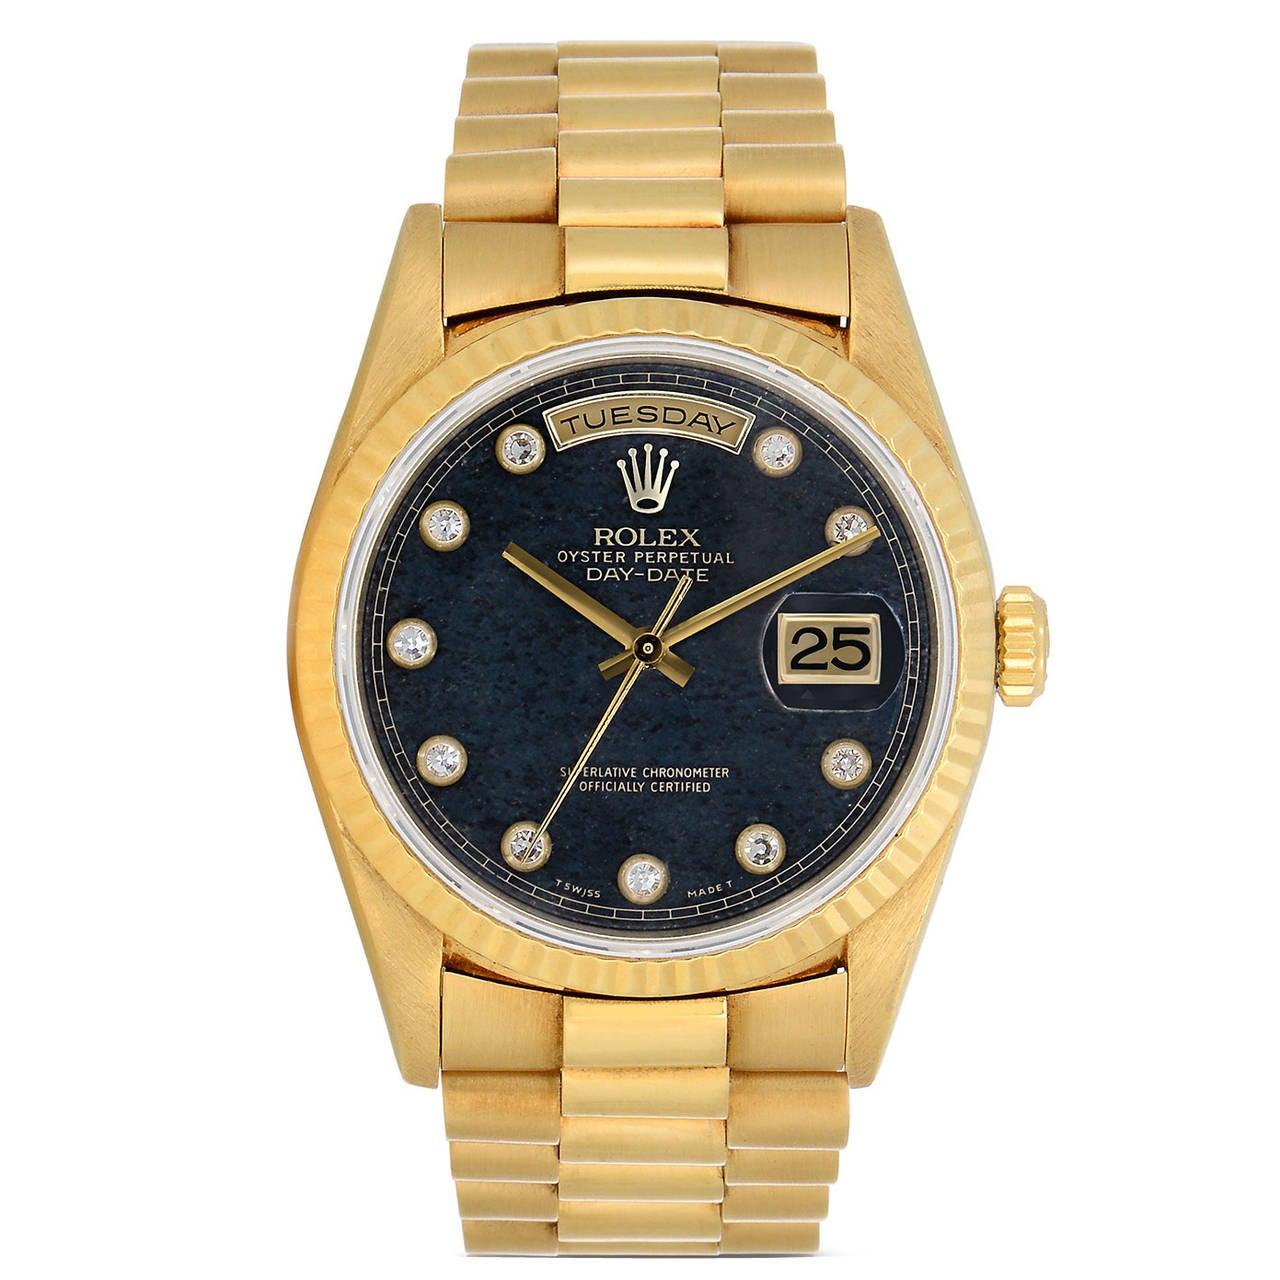 Rolex Yellow Gold Diamond Dial Perpetual Day-Date President Quartz Wristwatch